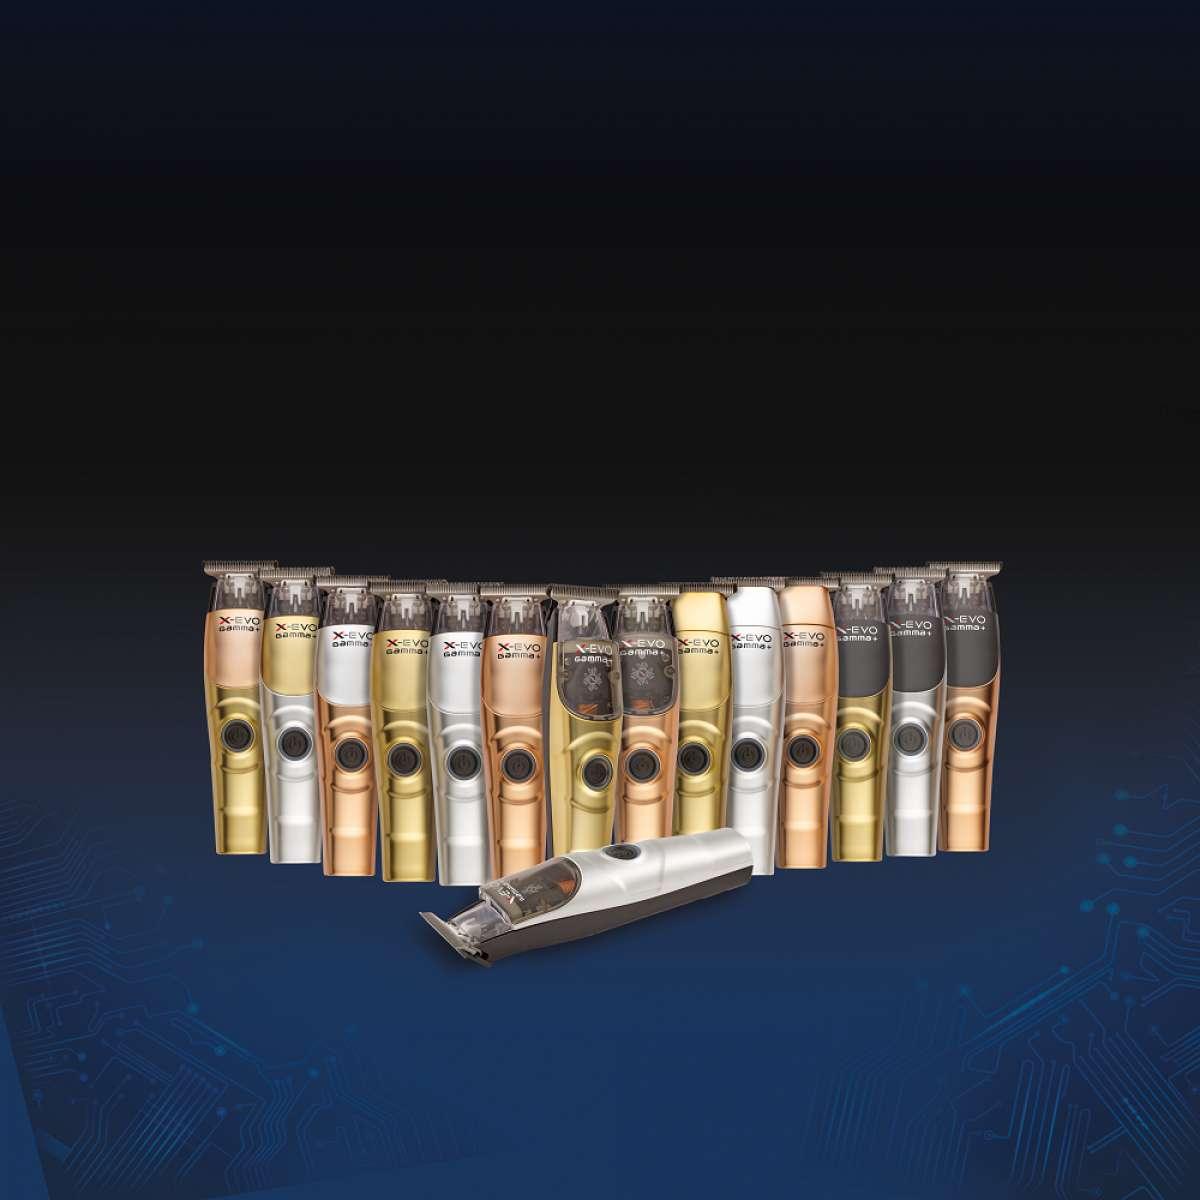 Gamma+ X-Evo Professional Modular Trimmer - Bronze, Silver, and Gold